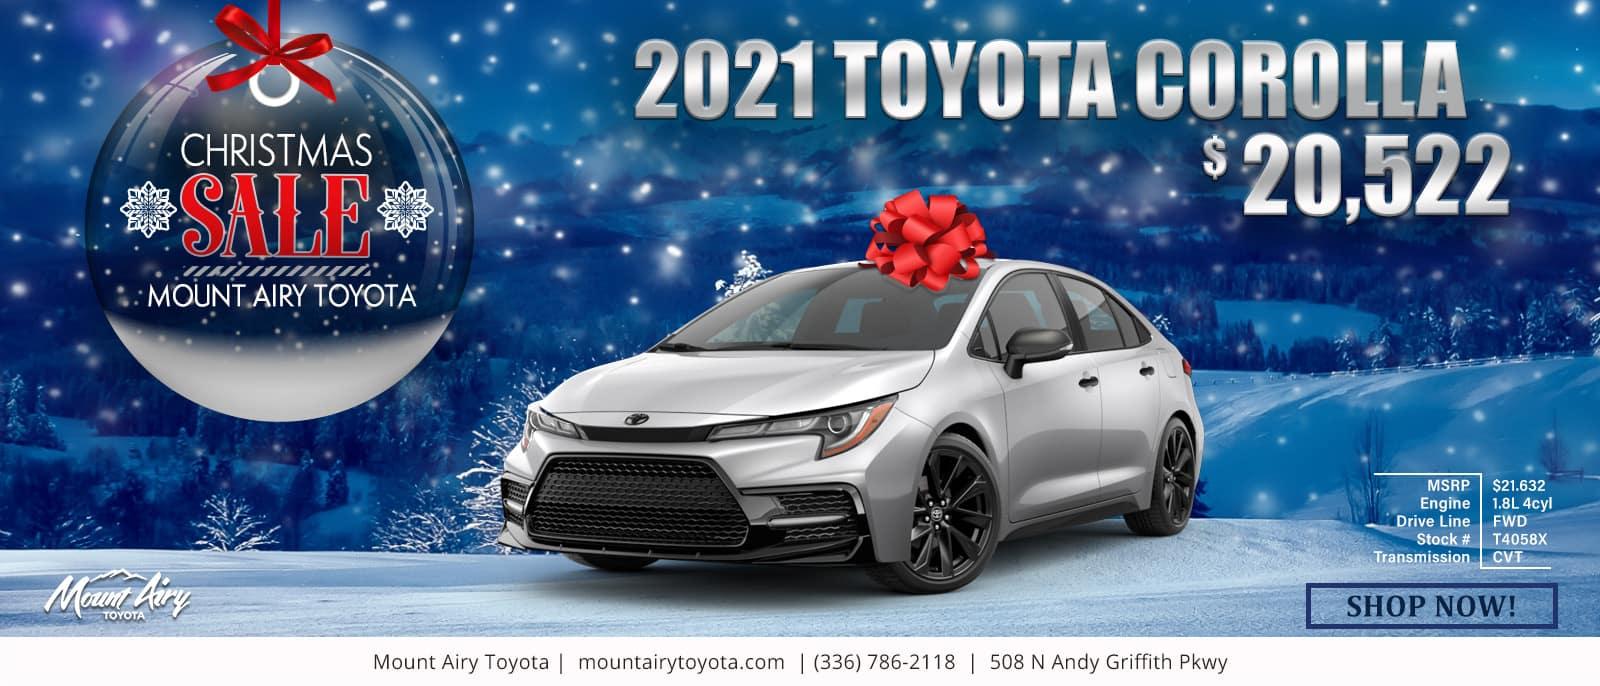 Toyota_November_2020_Slider_Corolla